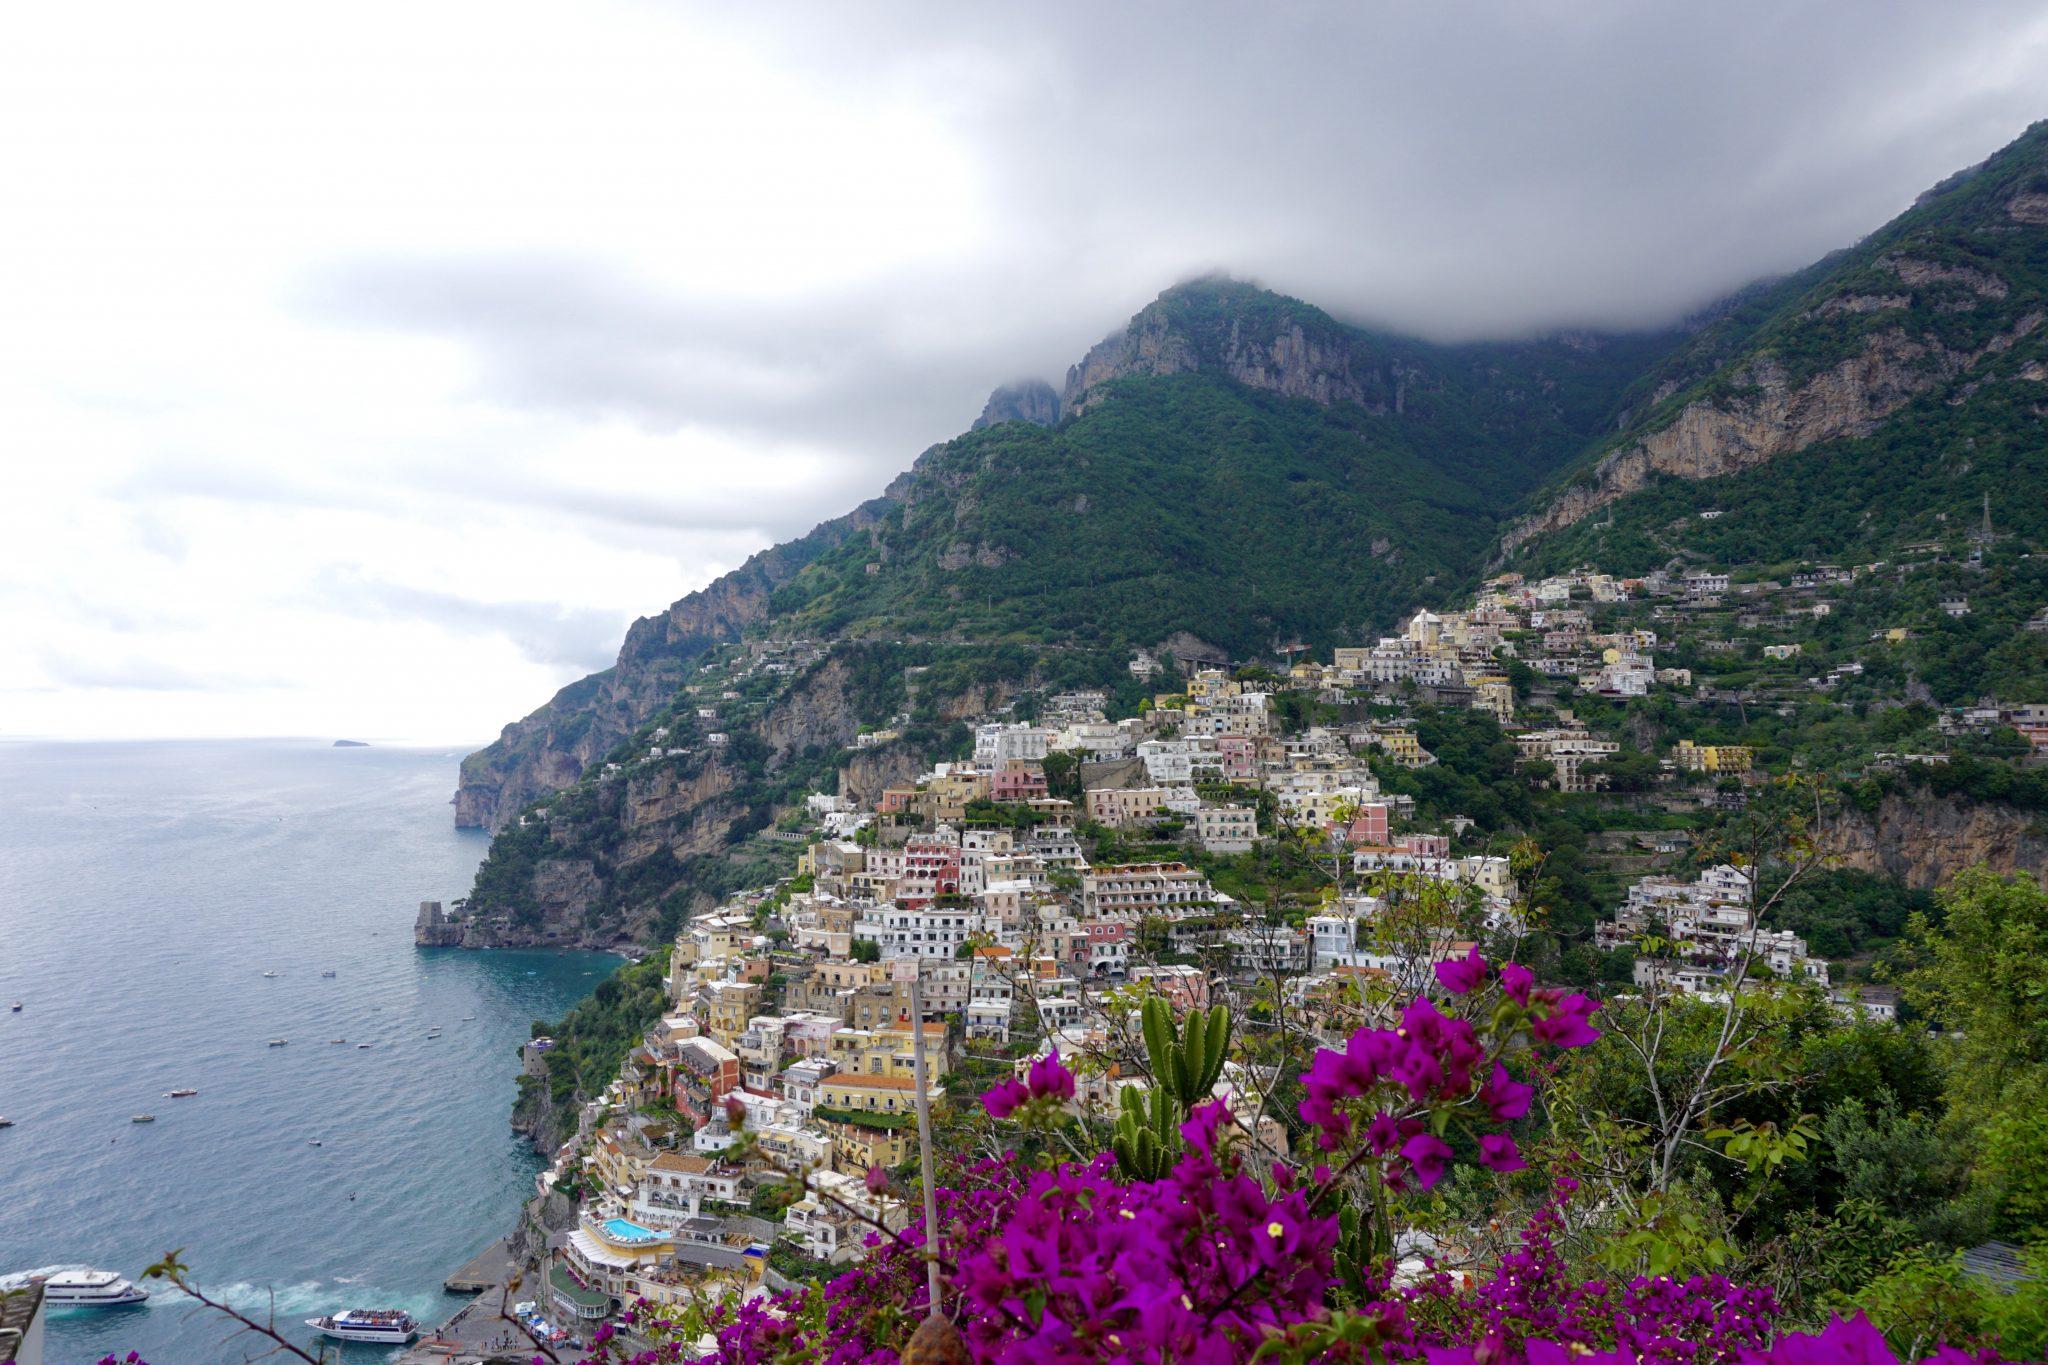 views of Positano, Italy